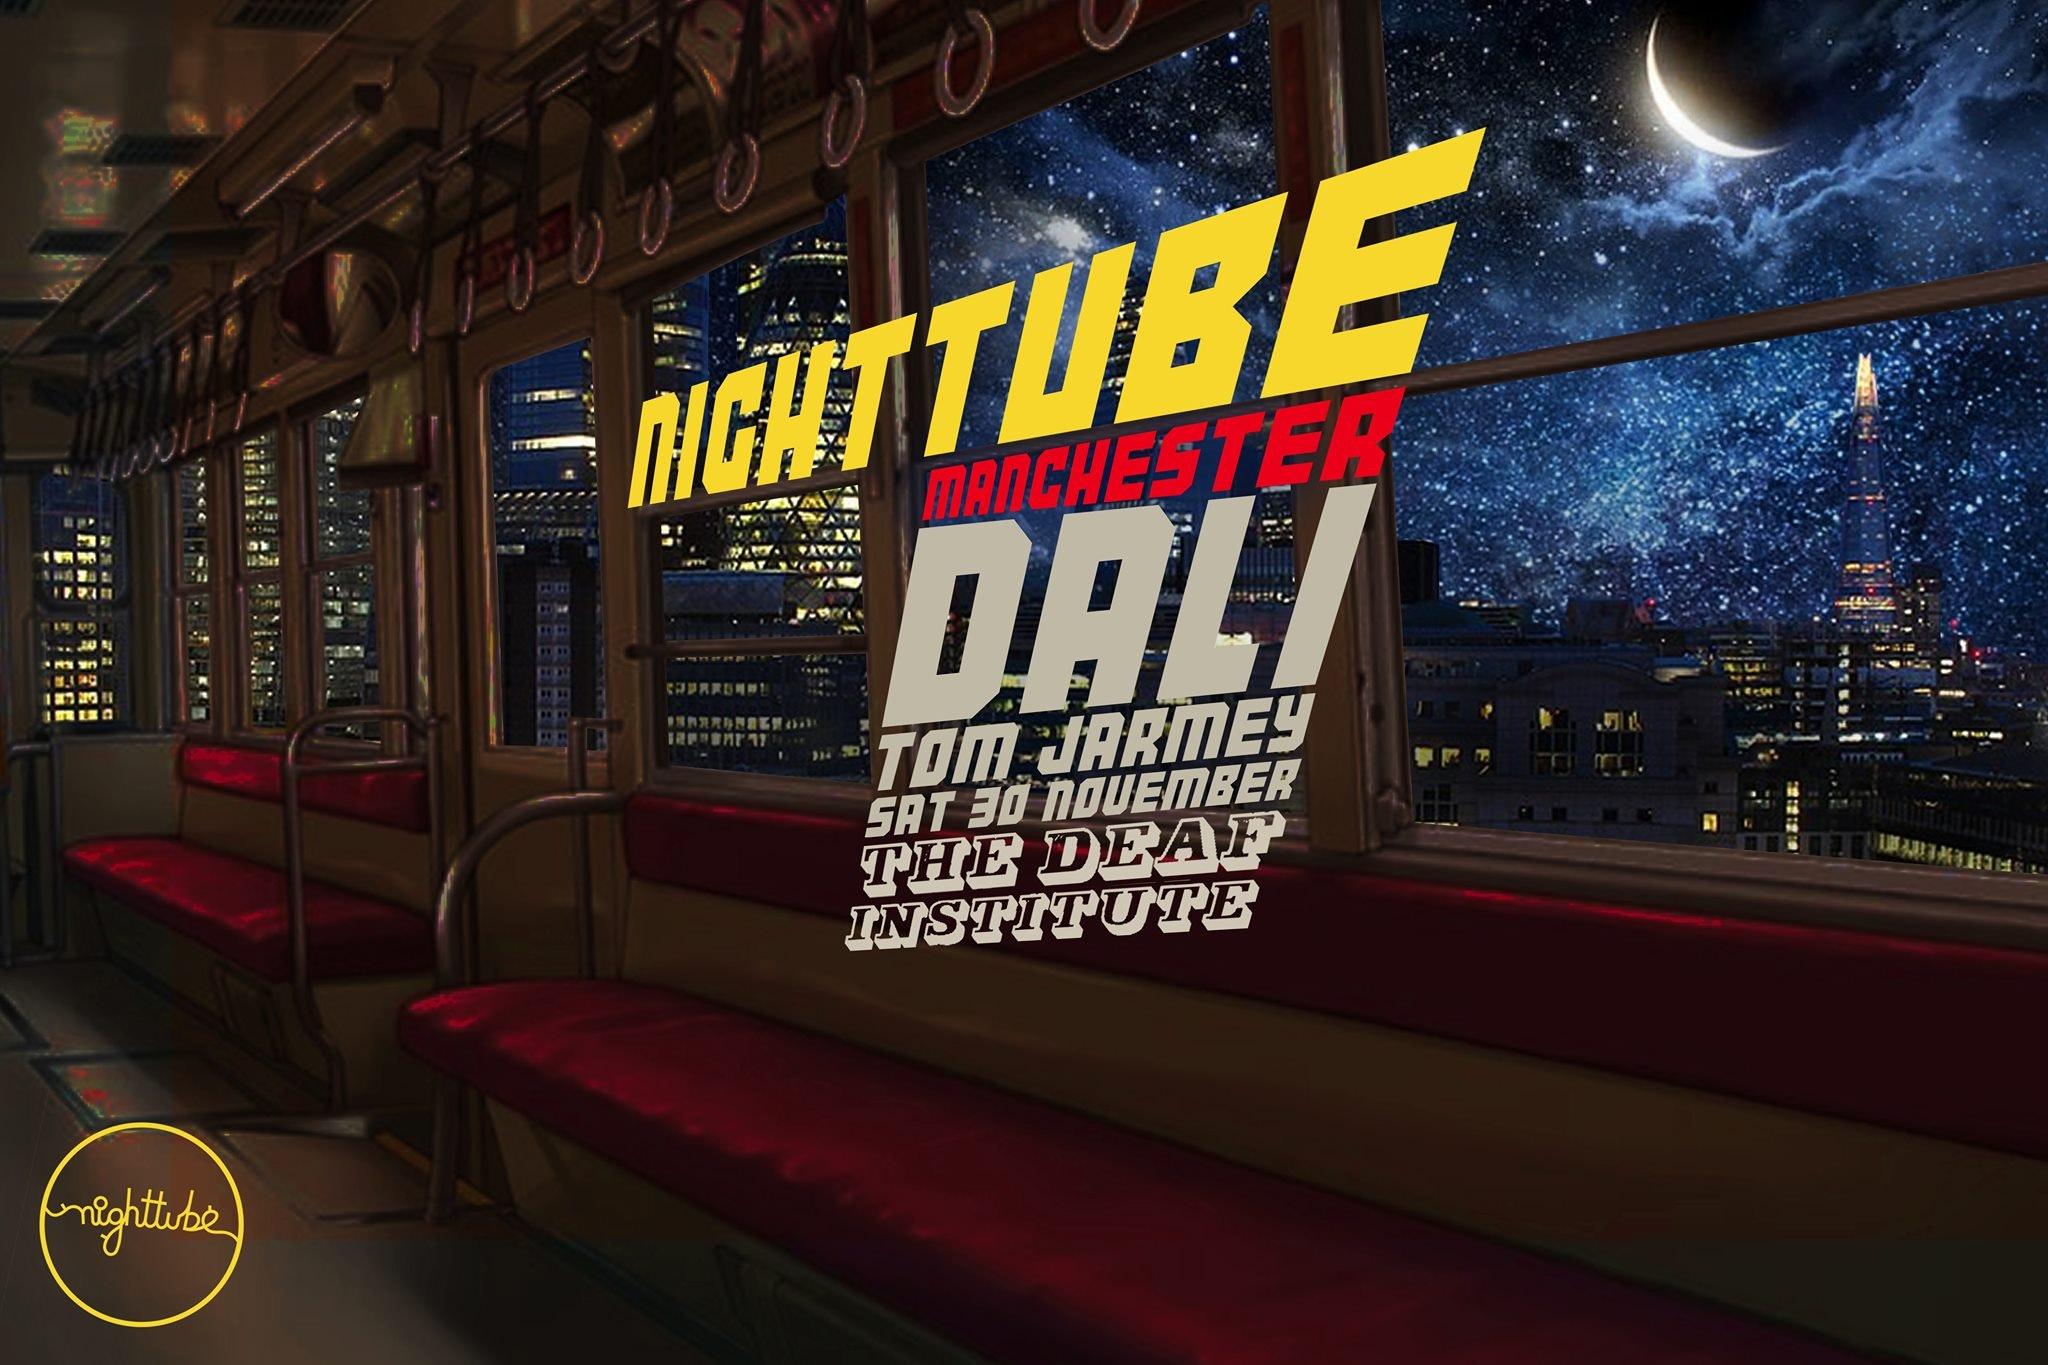 Night Tube: Manchester